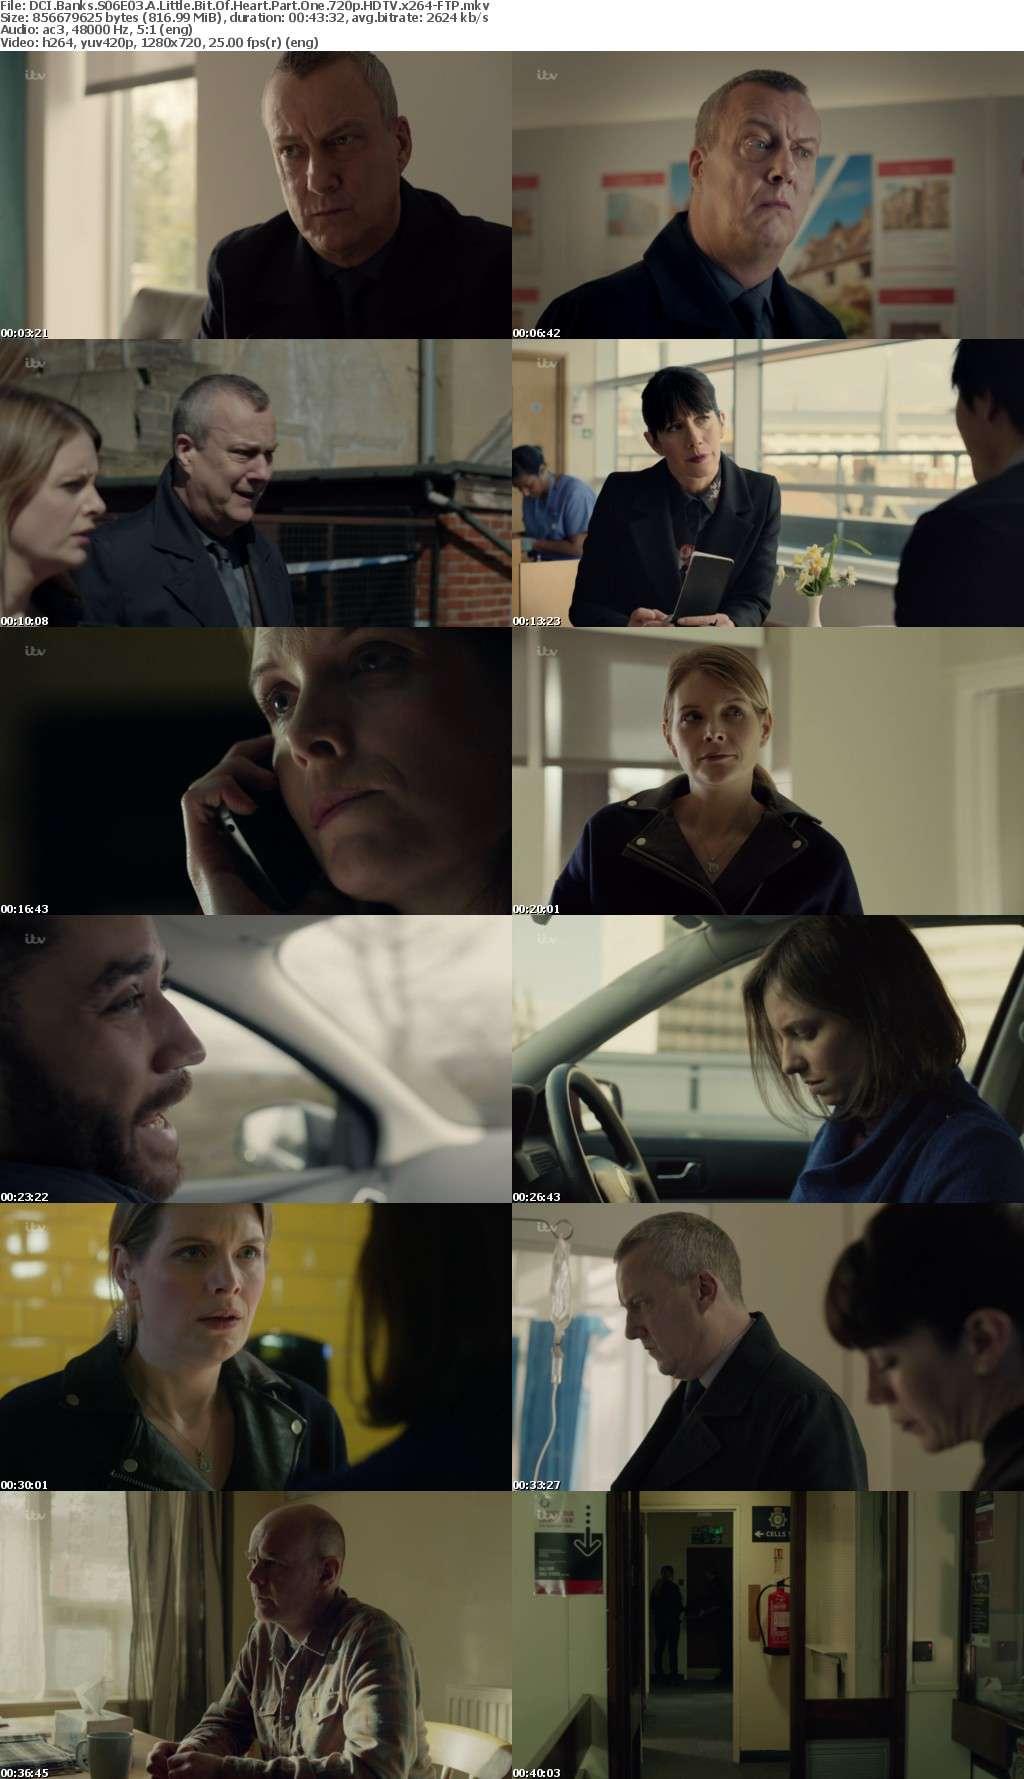 DCI Banks S06E03 A Little Bit Of Heart Part One 720p HDTV x264-FTP